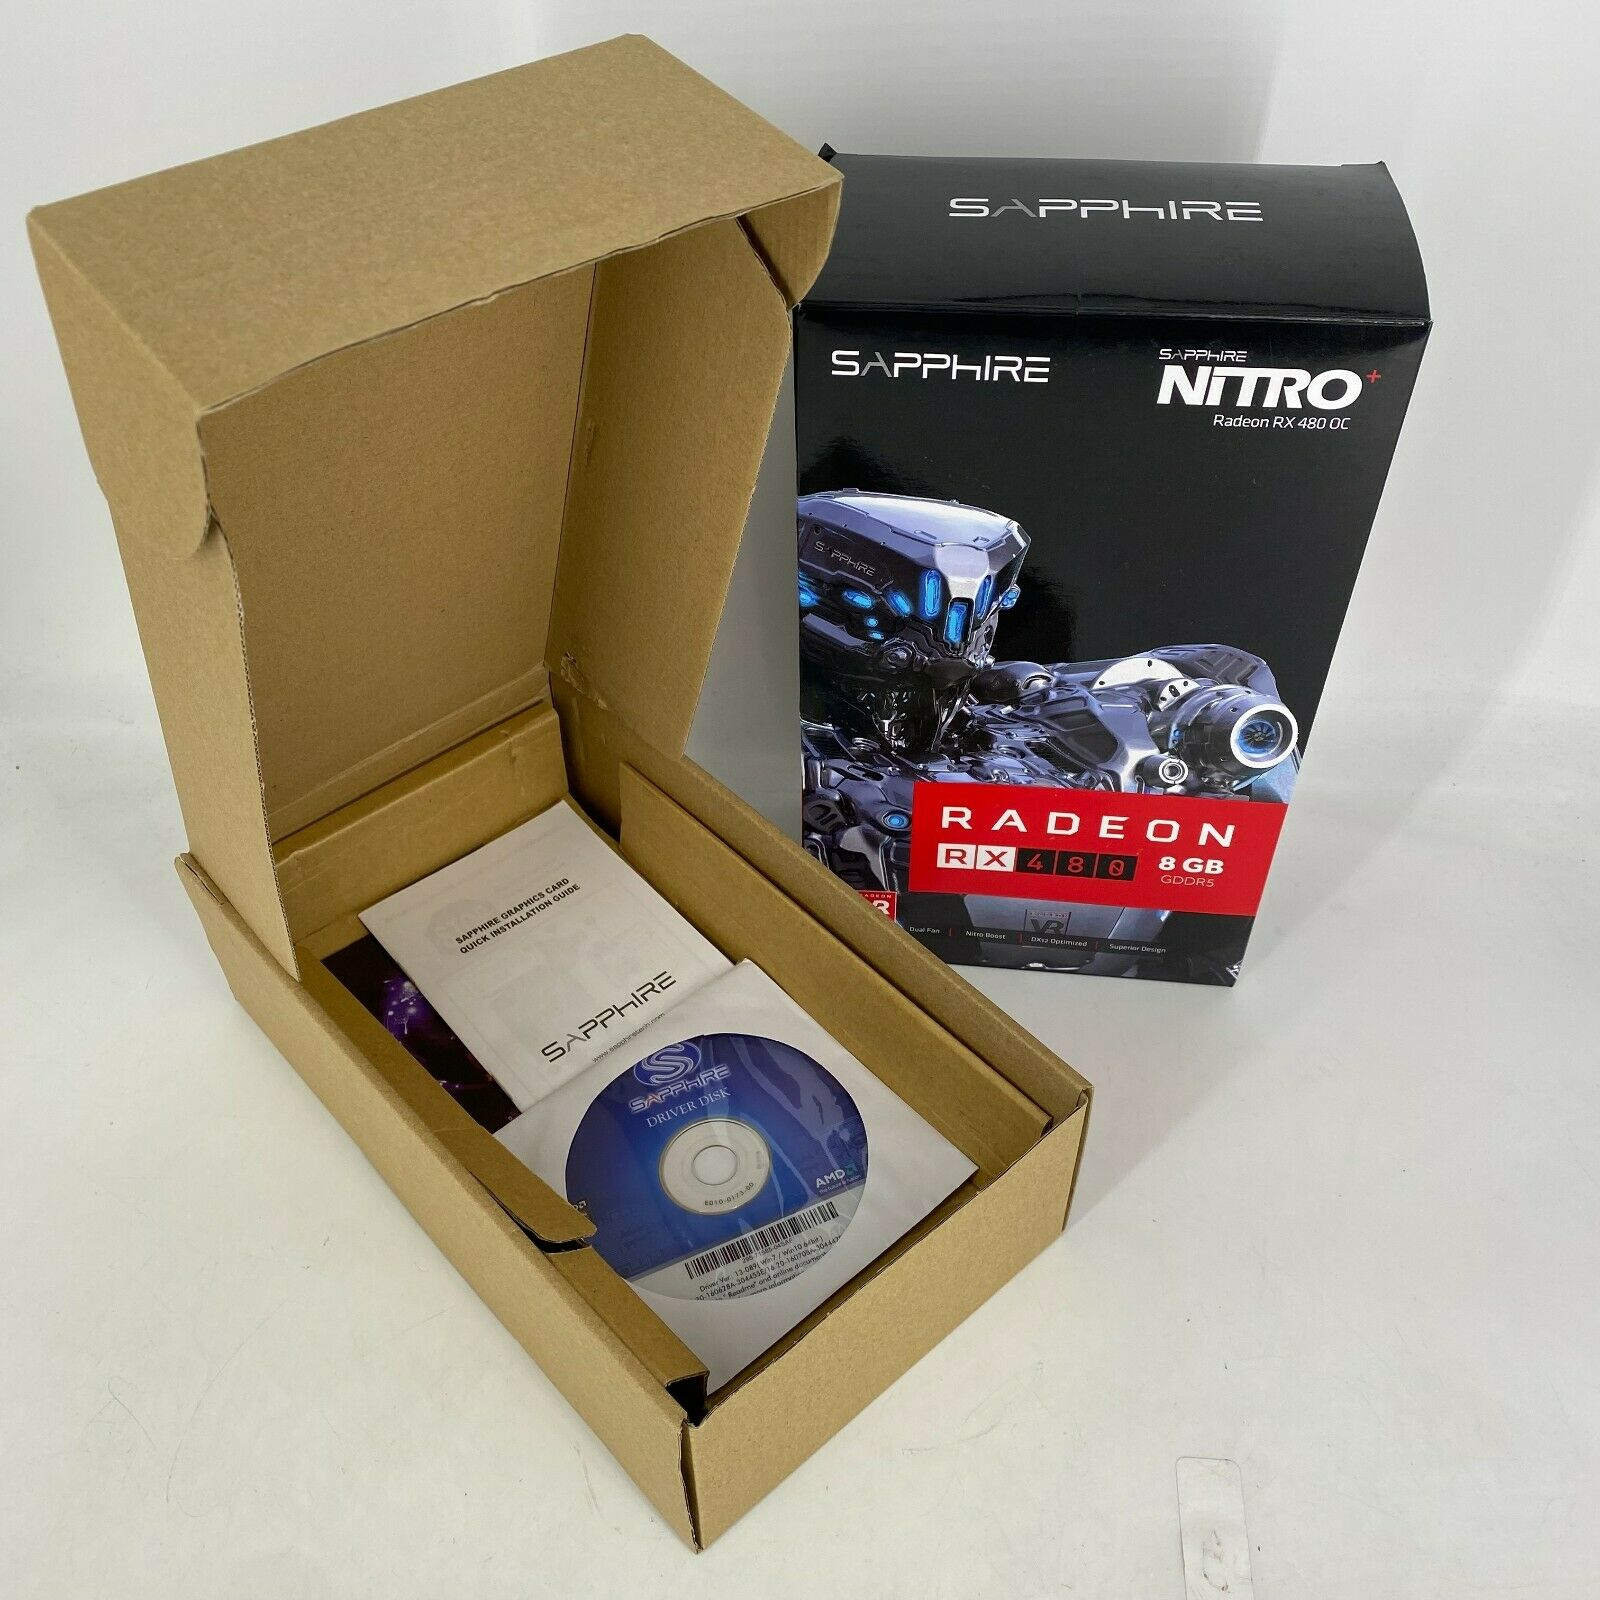 *EMPTY BOX* for - Sapphire NITRO+ OC RX 480 RX480 8Gb Radeon 8 Gb * NO GPU*